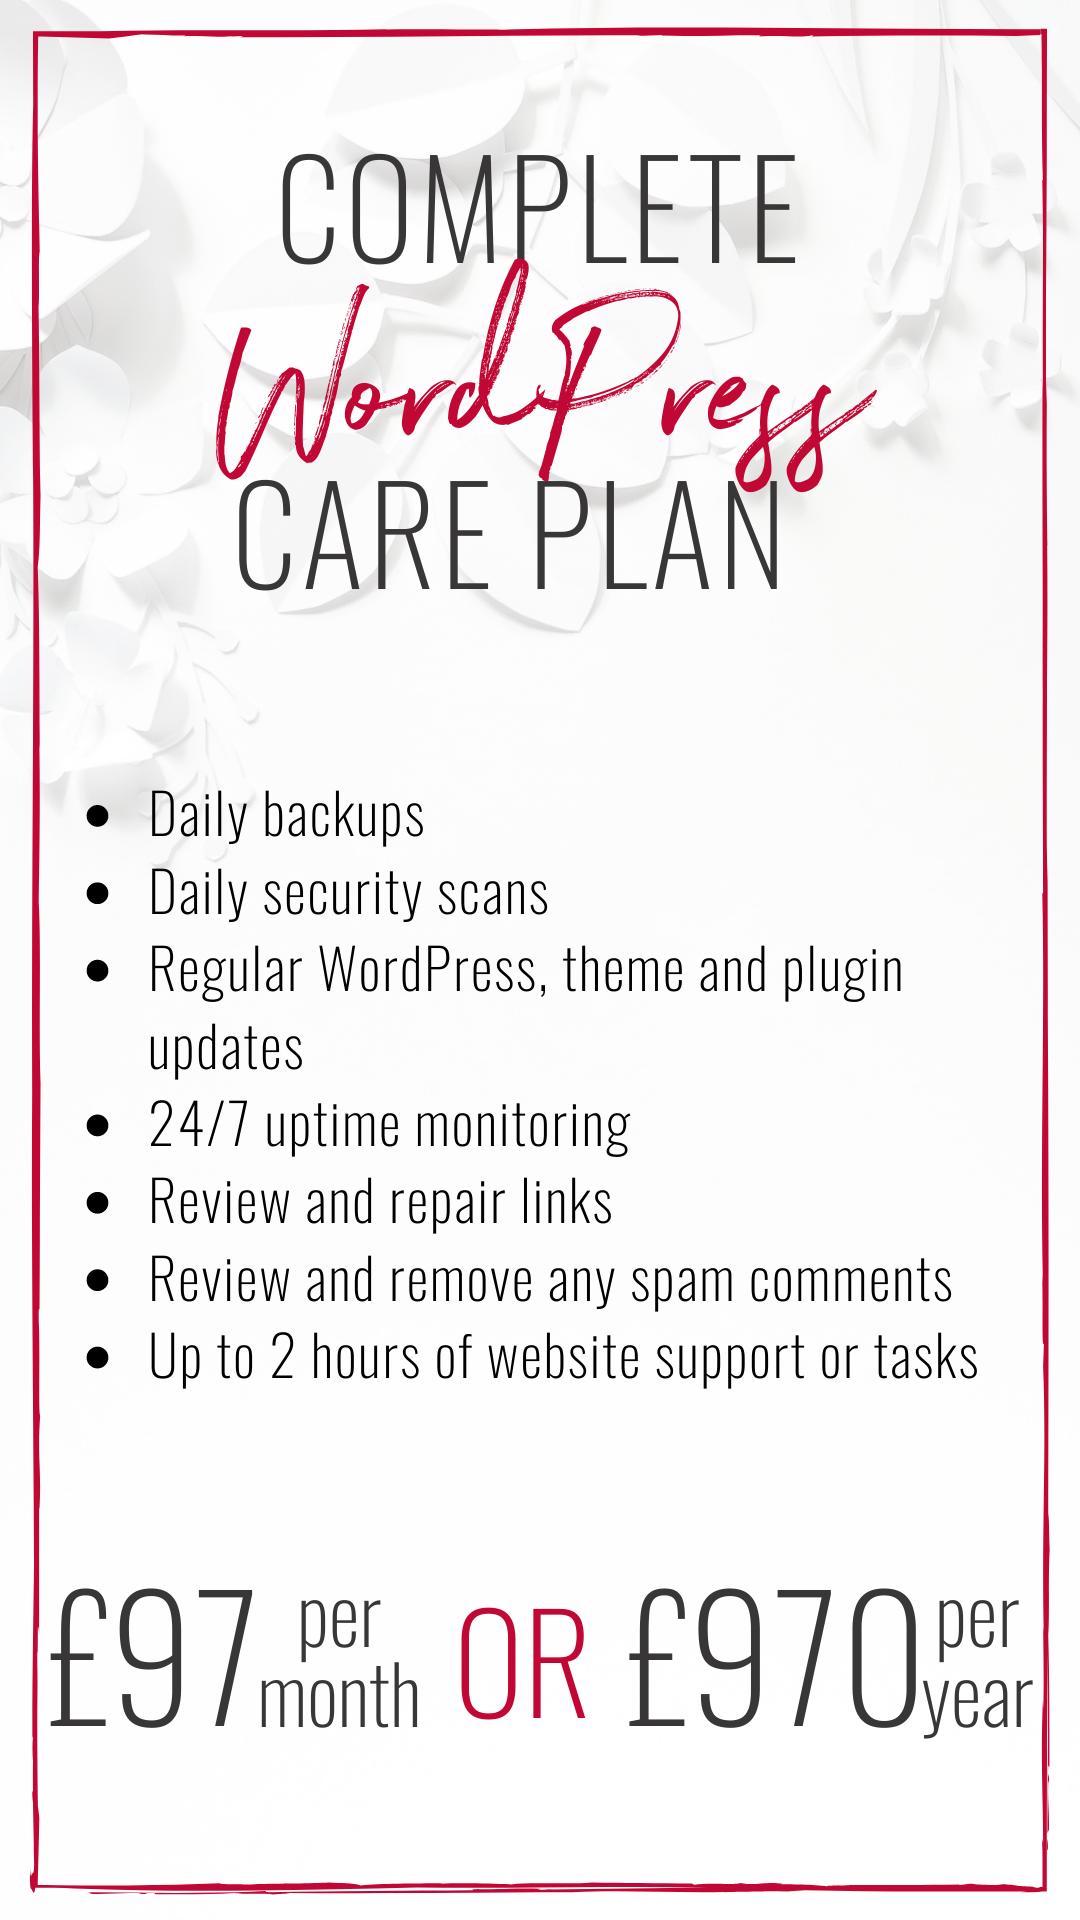 WordPress Website Complete Care Package